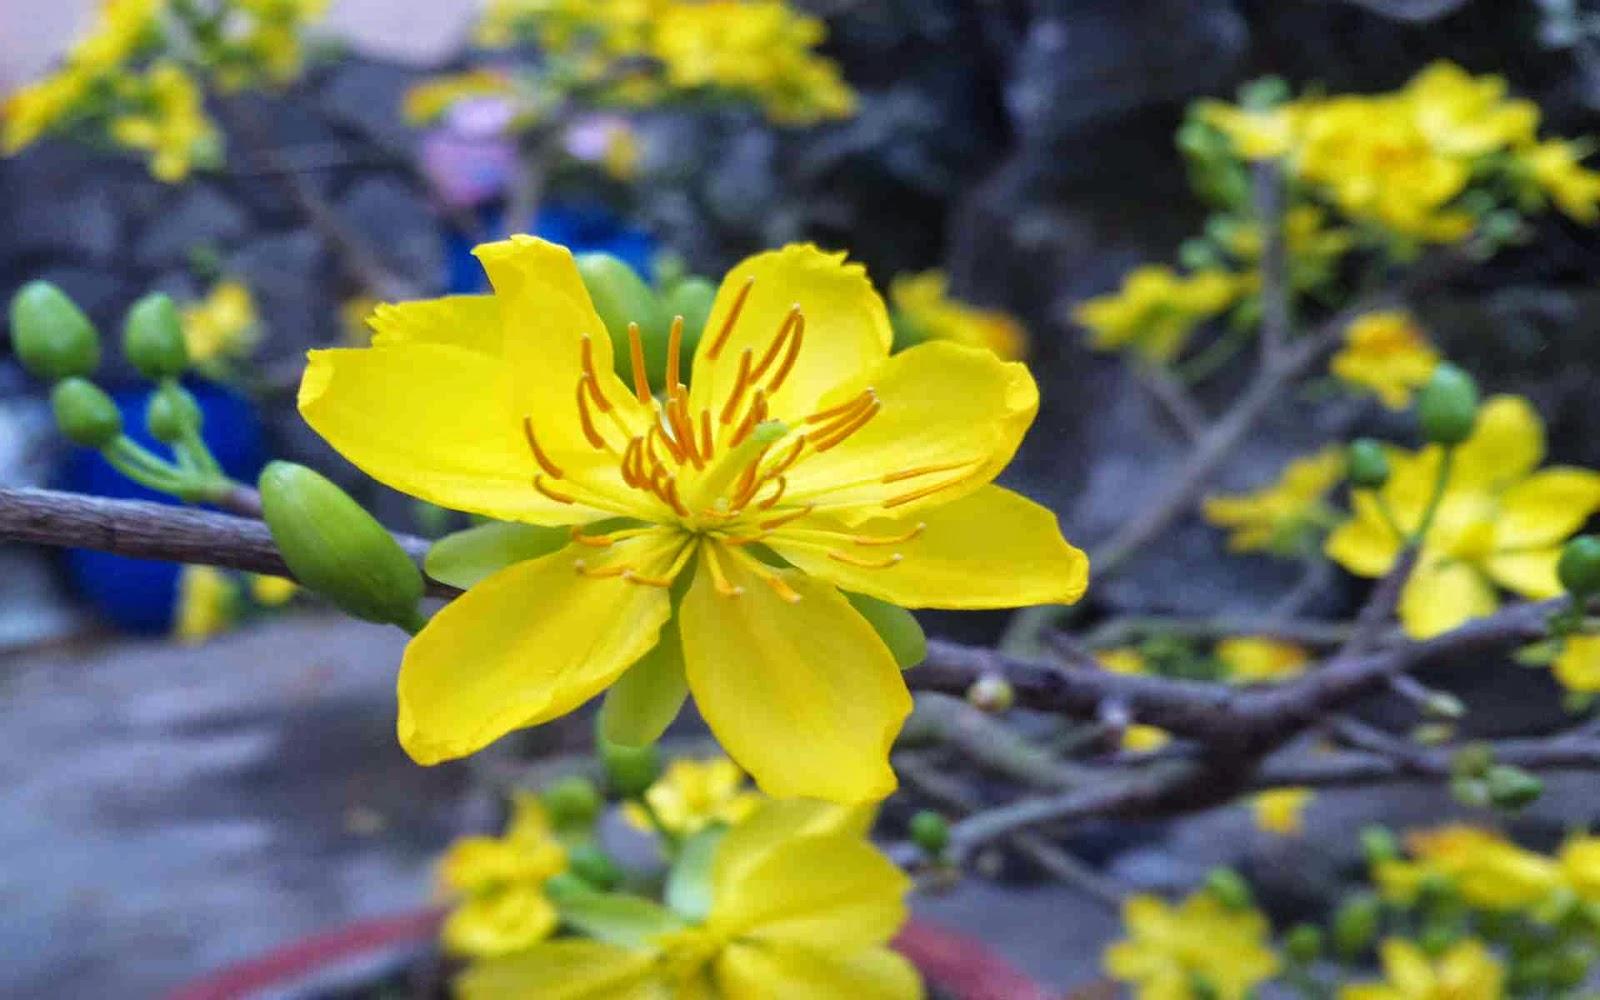 hình nền hoa mai tết 2015